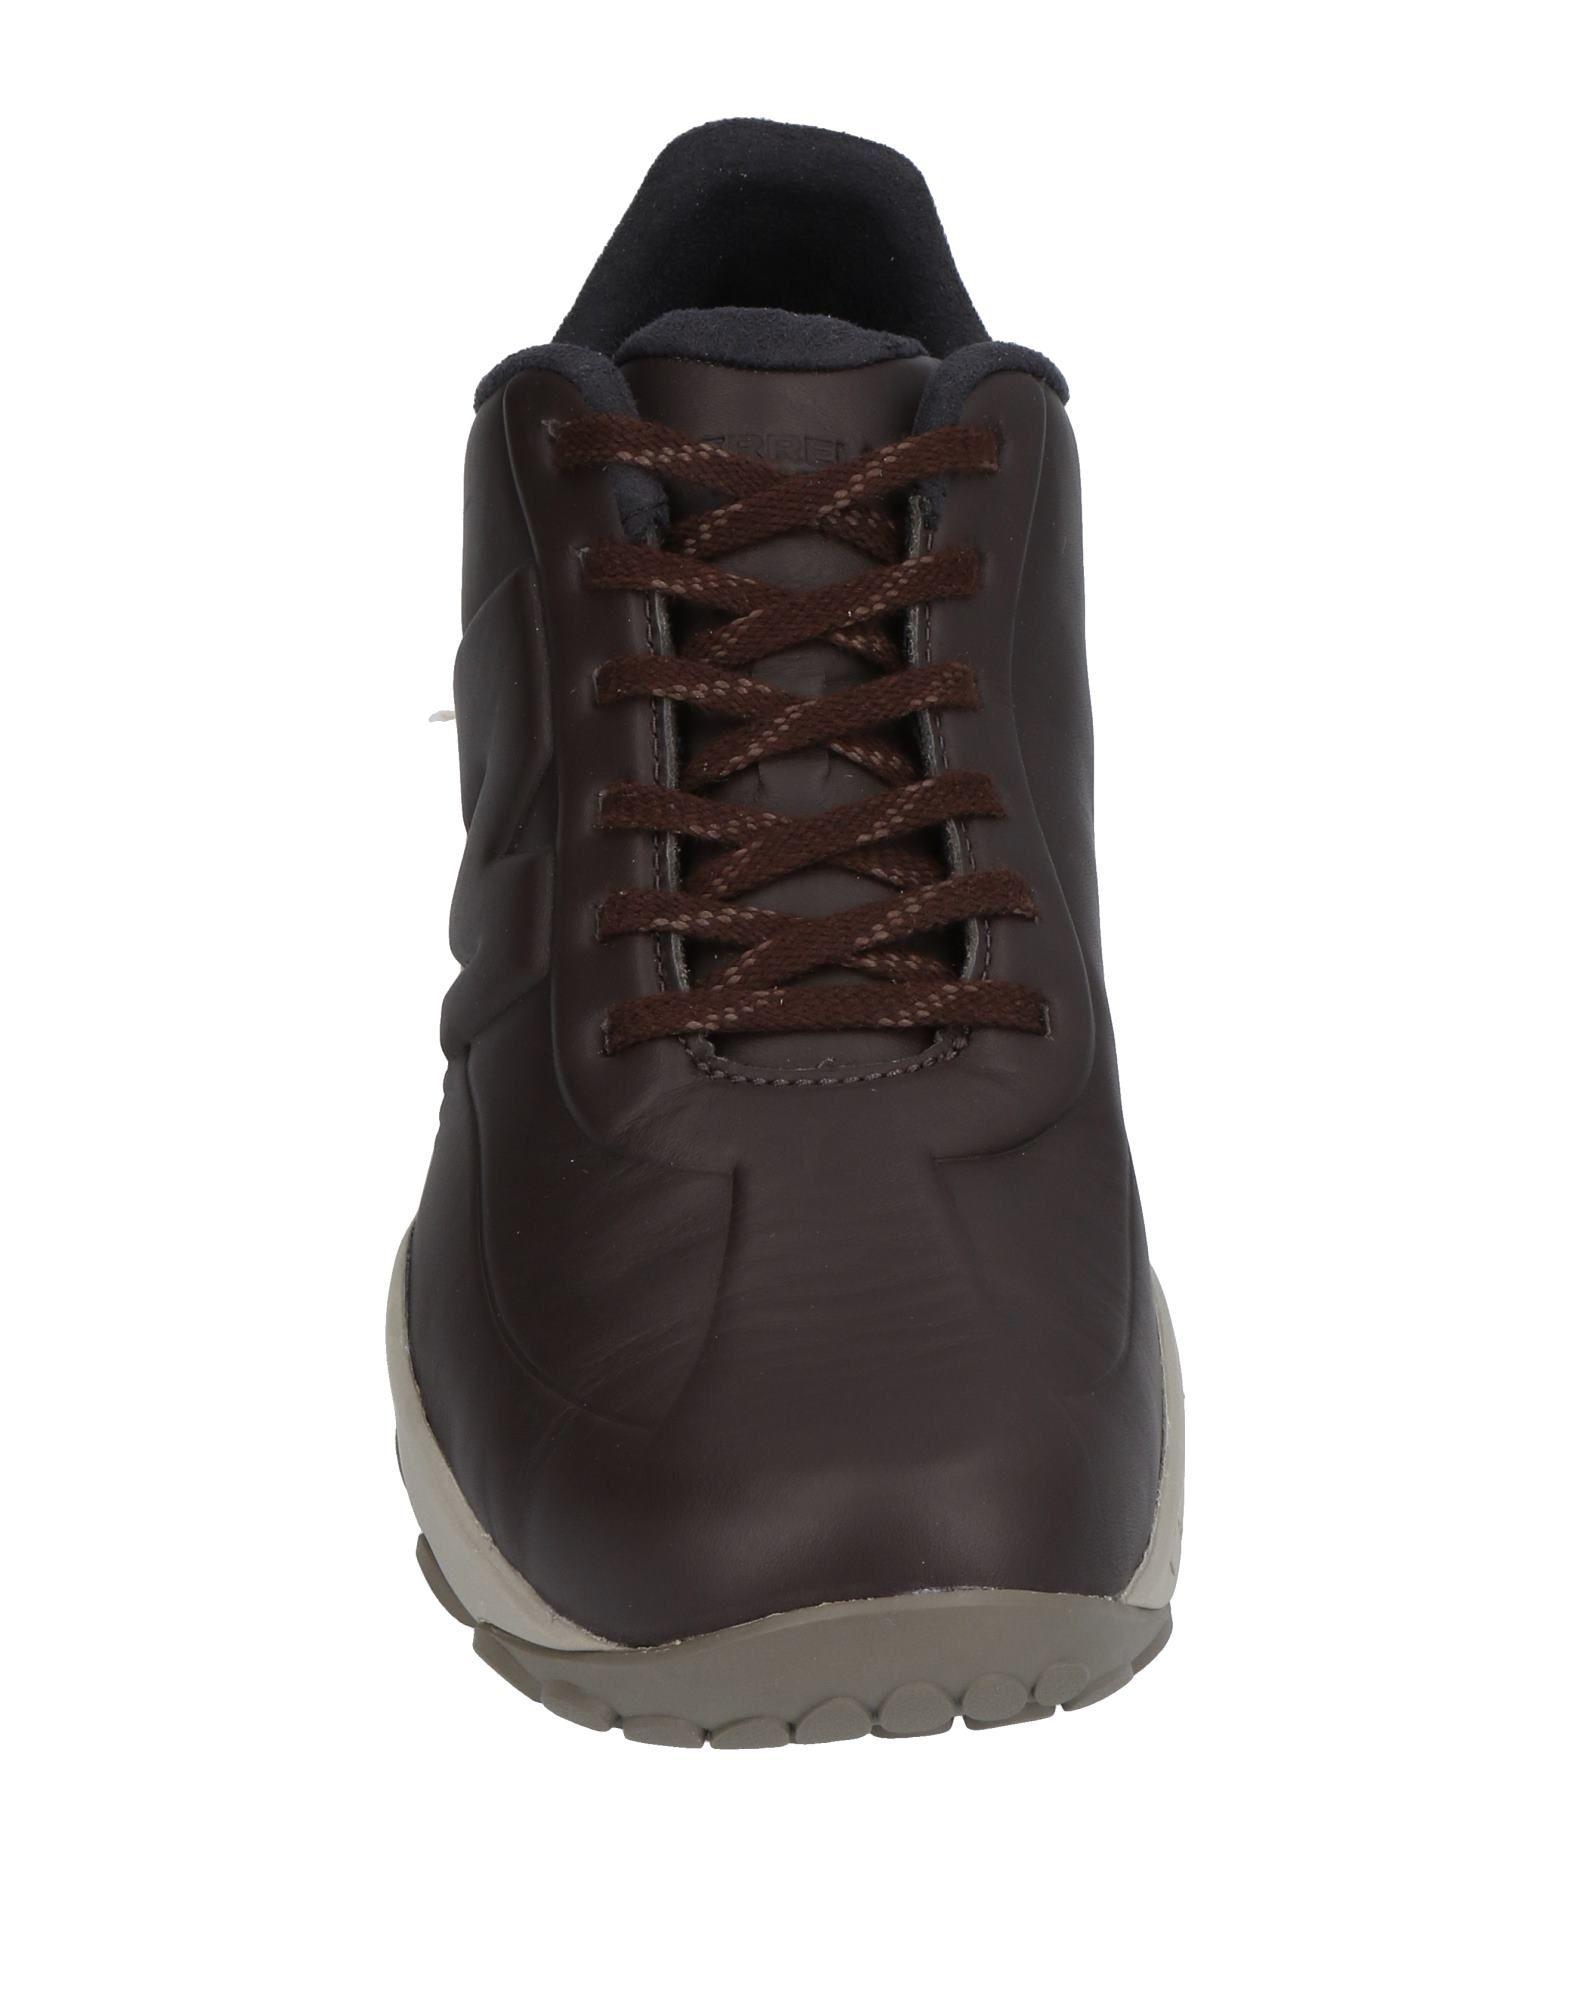 Rabatt echte Schuhe Herren Merrell Sneakers Herren Schuhe  11458887QI 3fddab